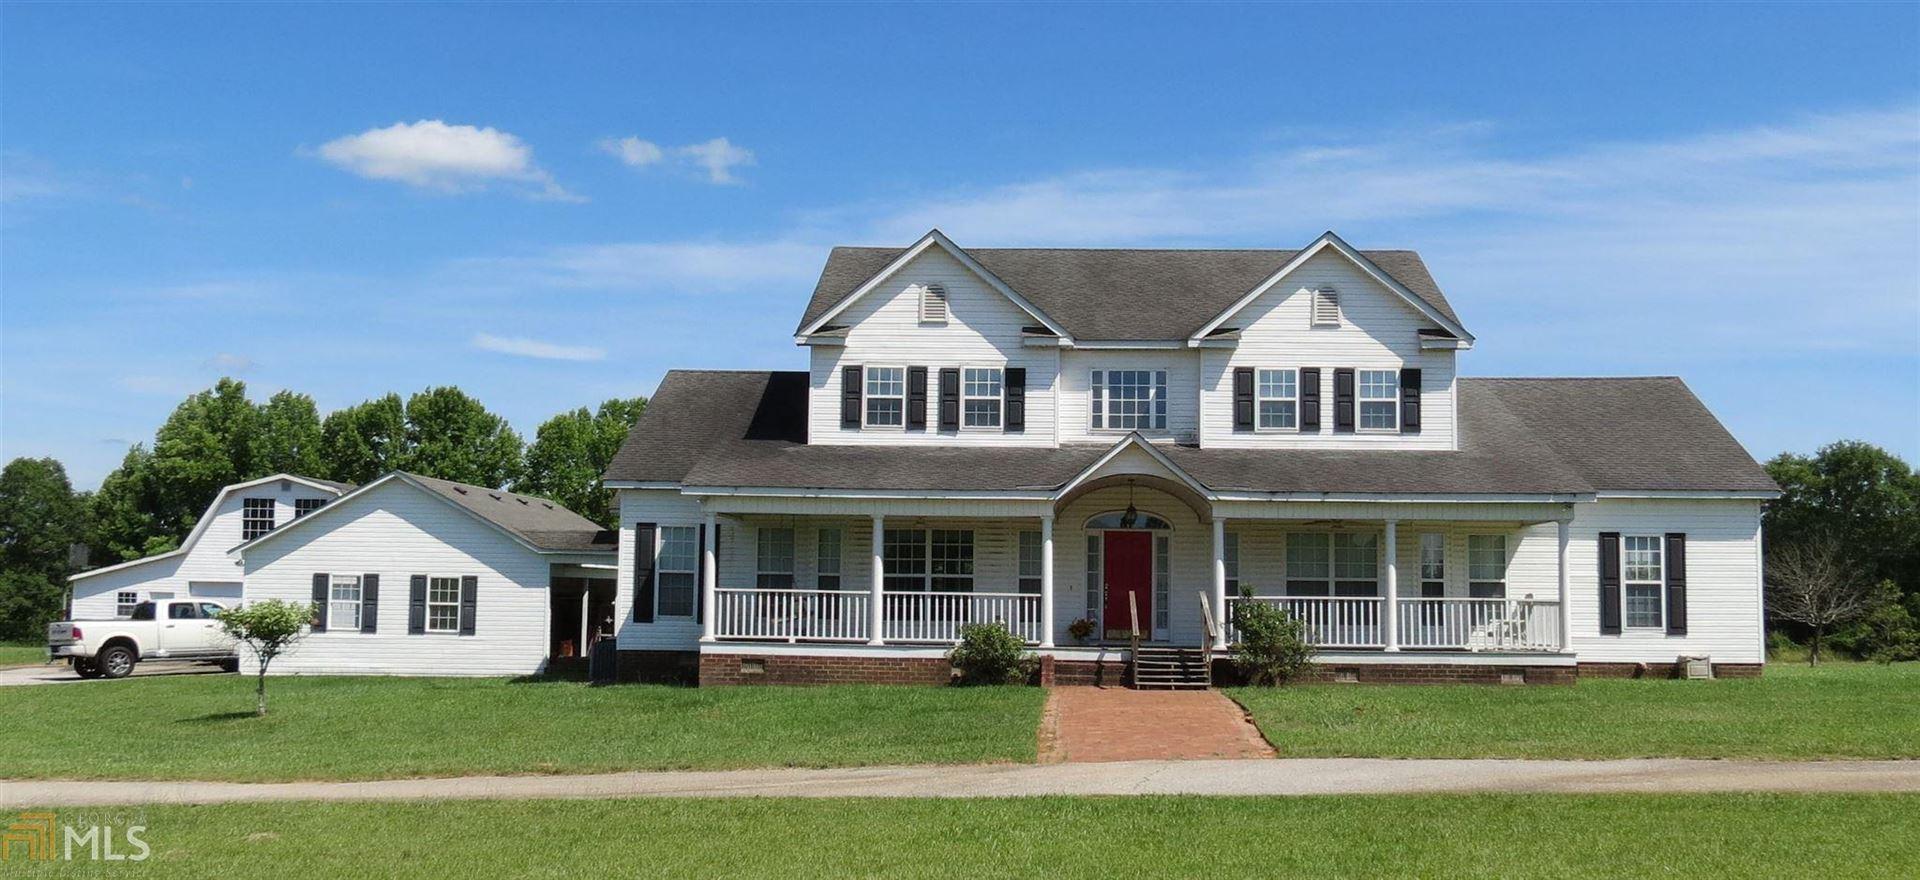 102 Quigley Ln, Meansville, GA 30256 - #: 8987474